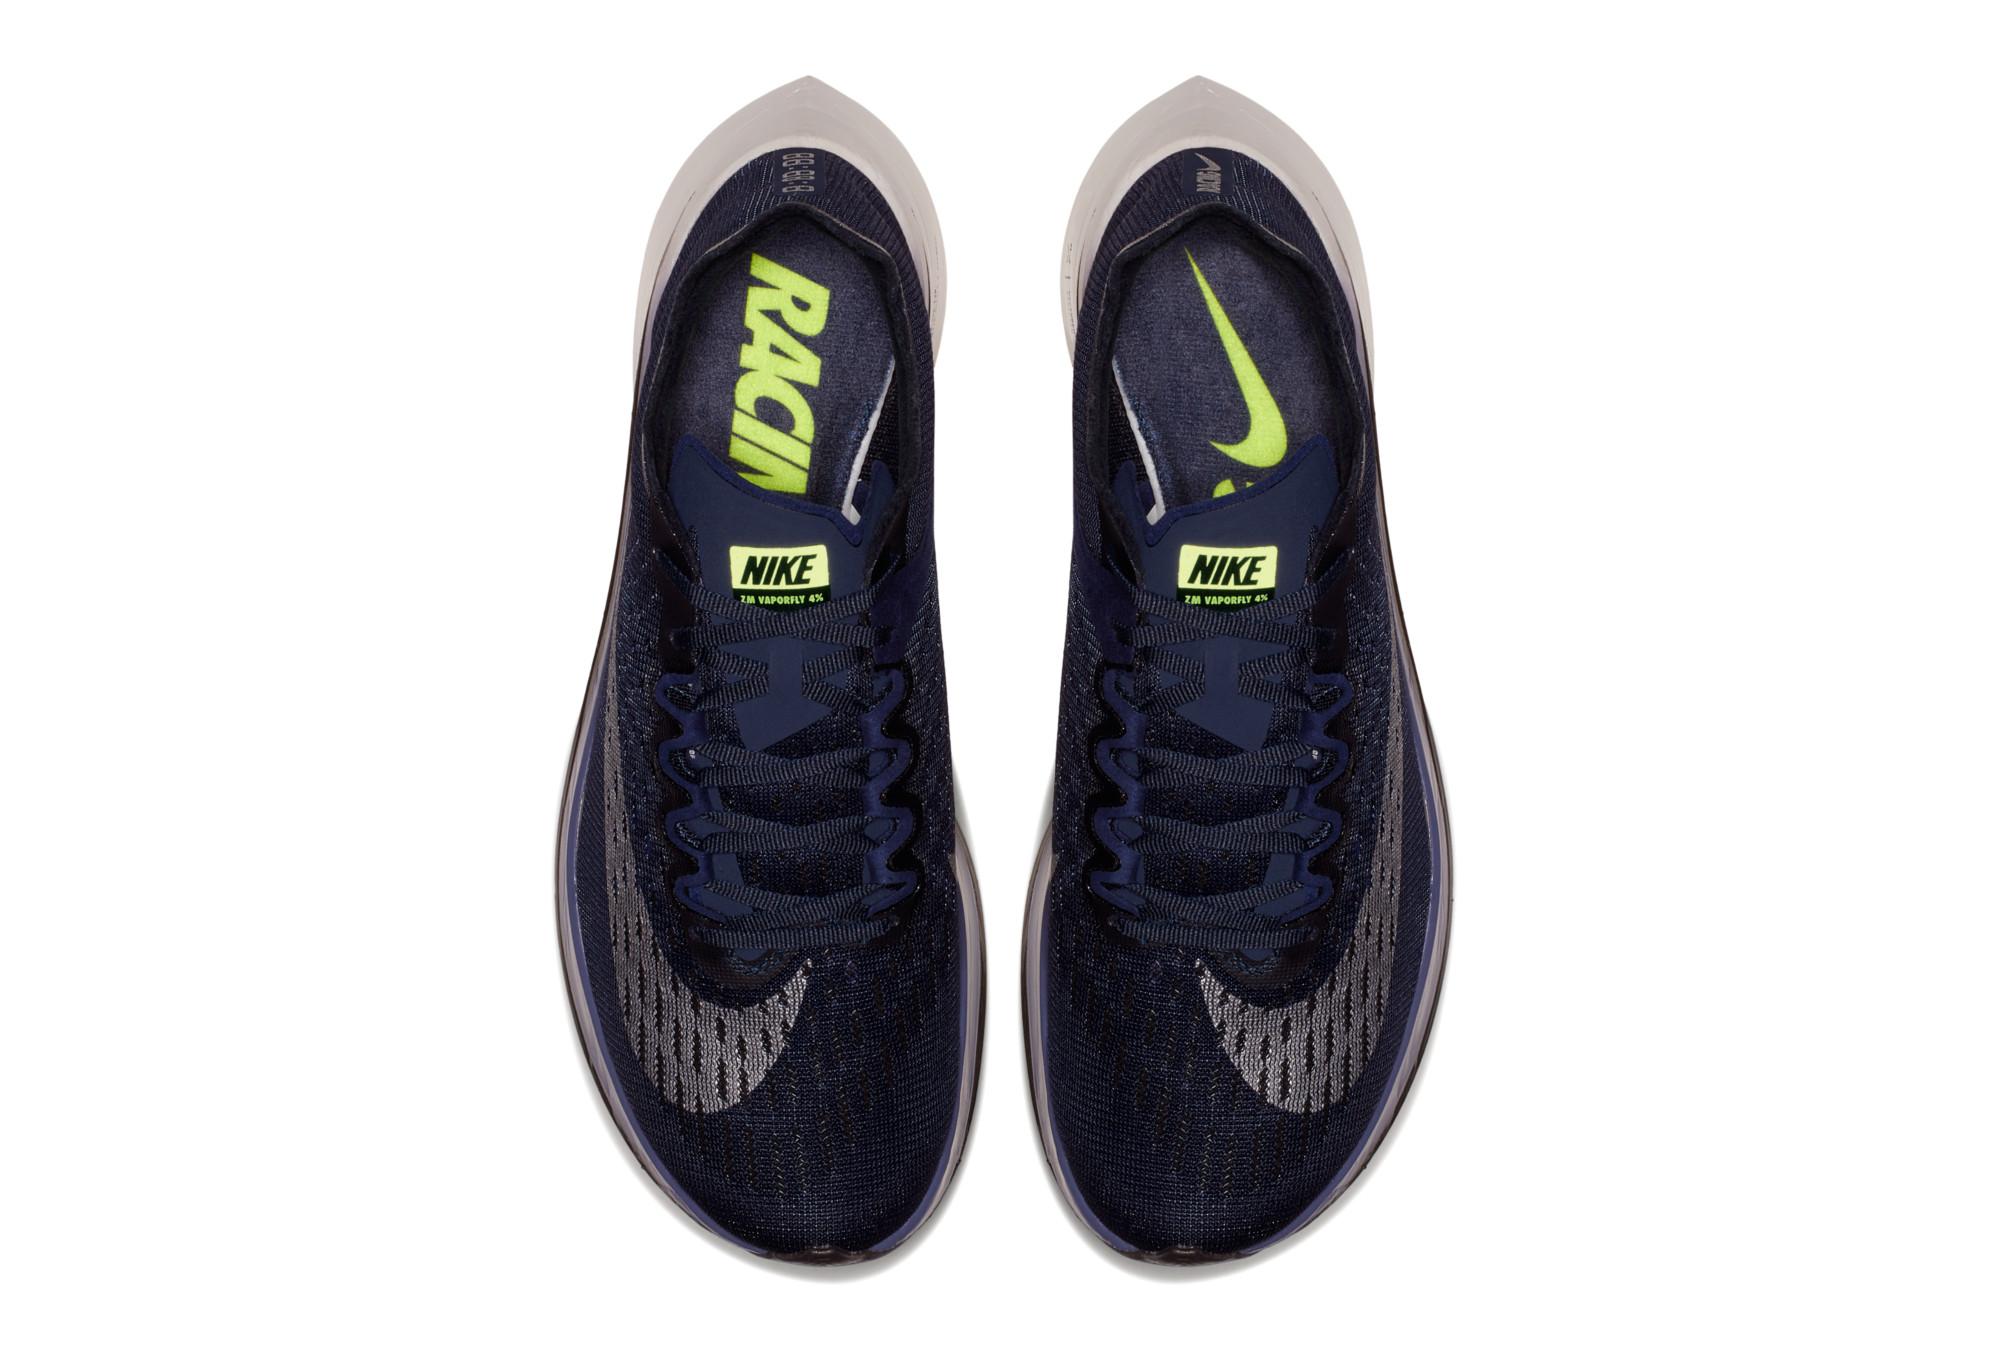 6b6d74846b30 NIKE Zoom Vaporfly 4% Shoes Green Orange Men